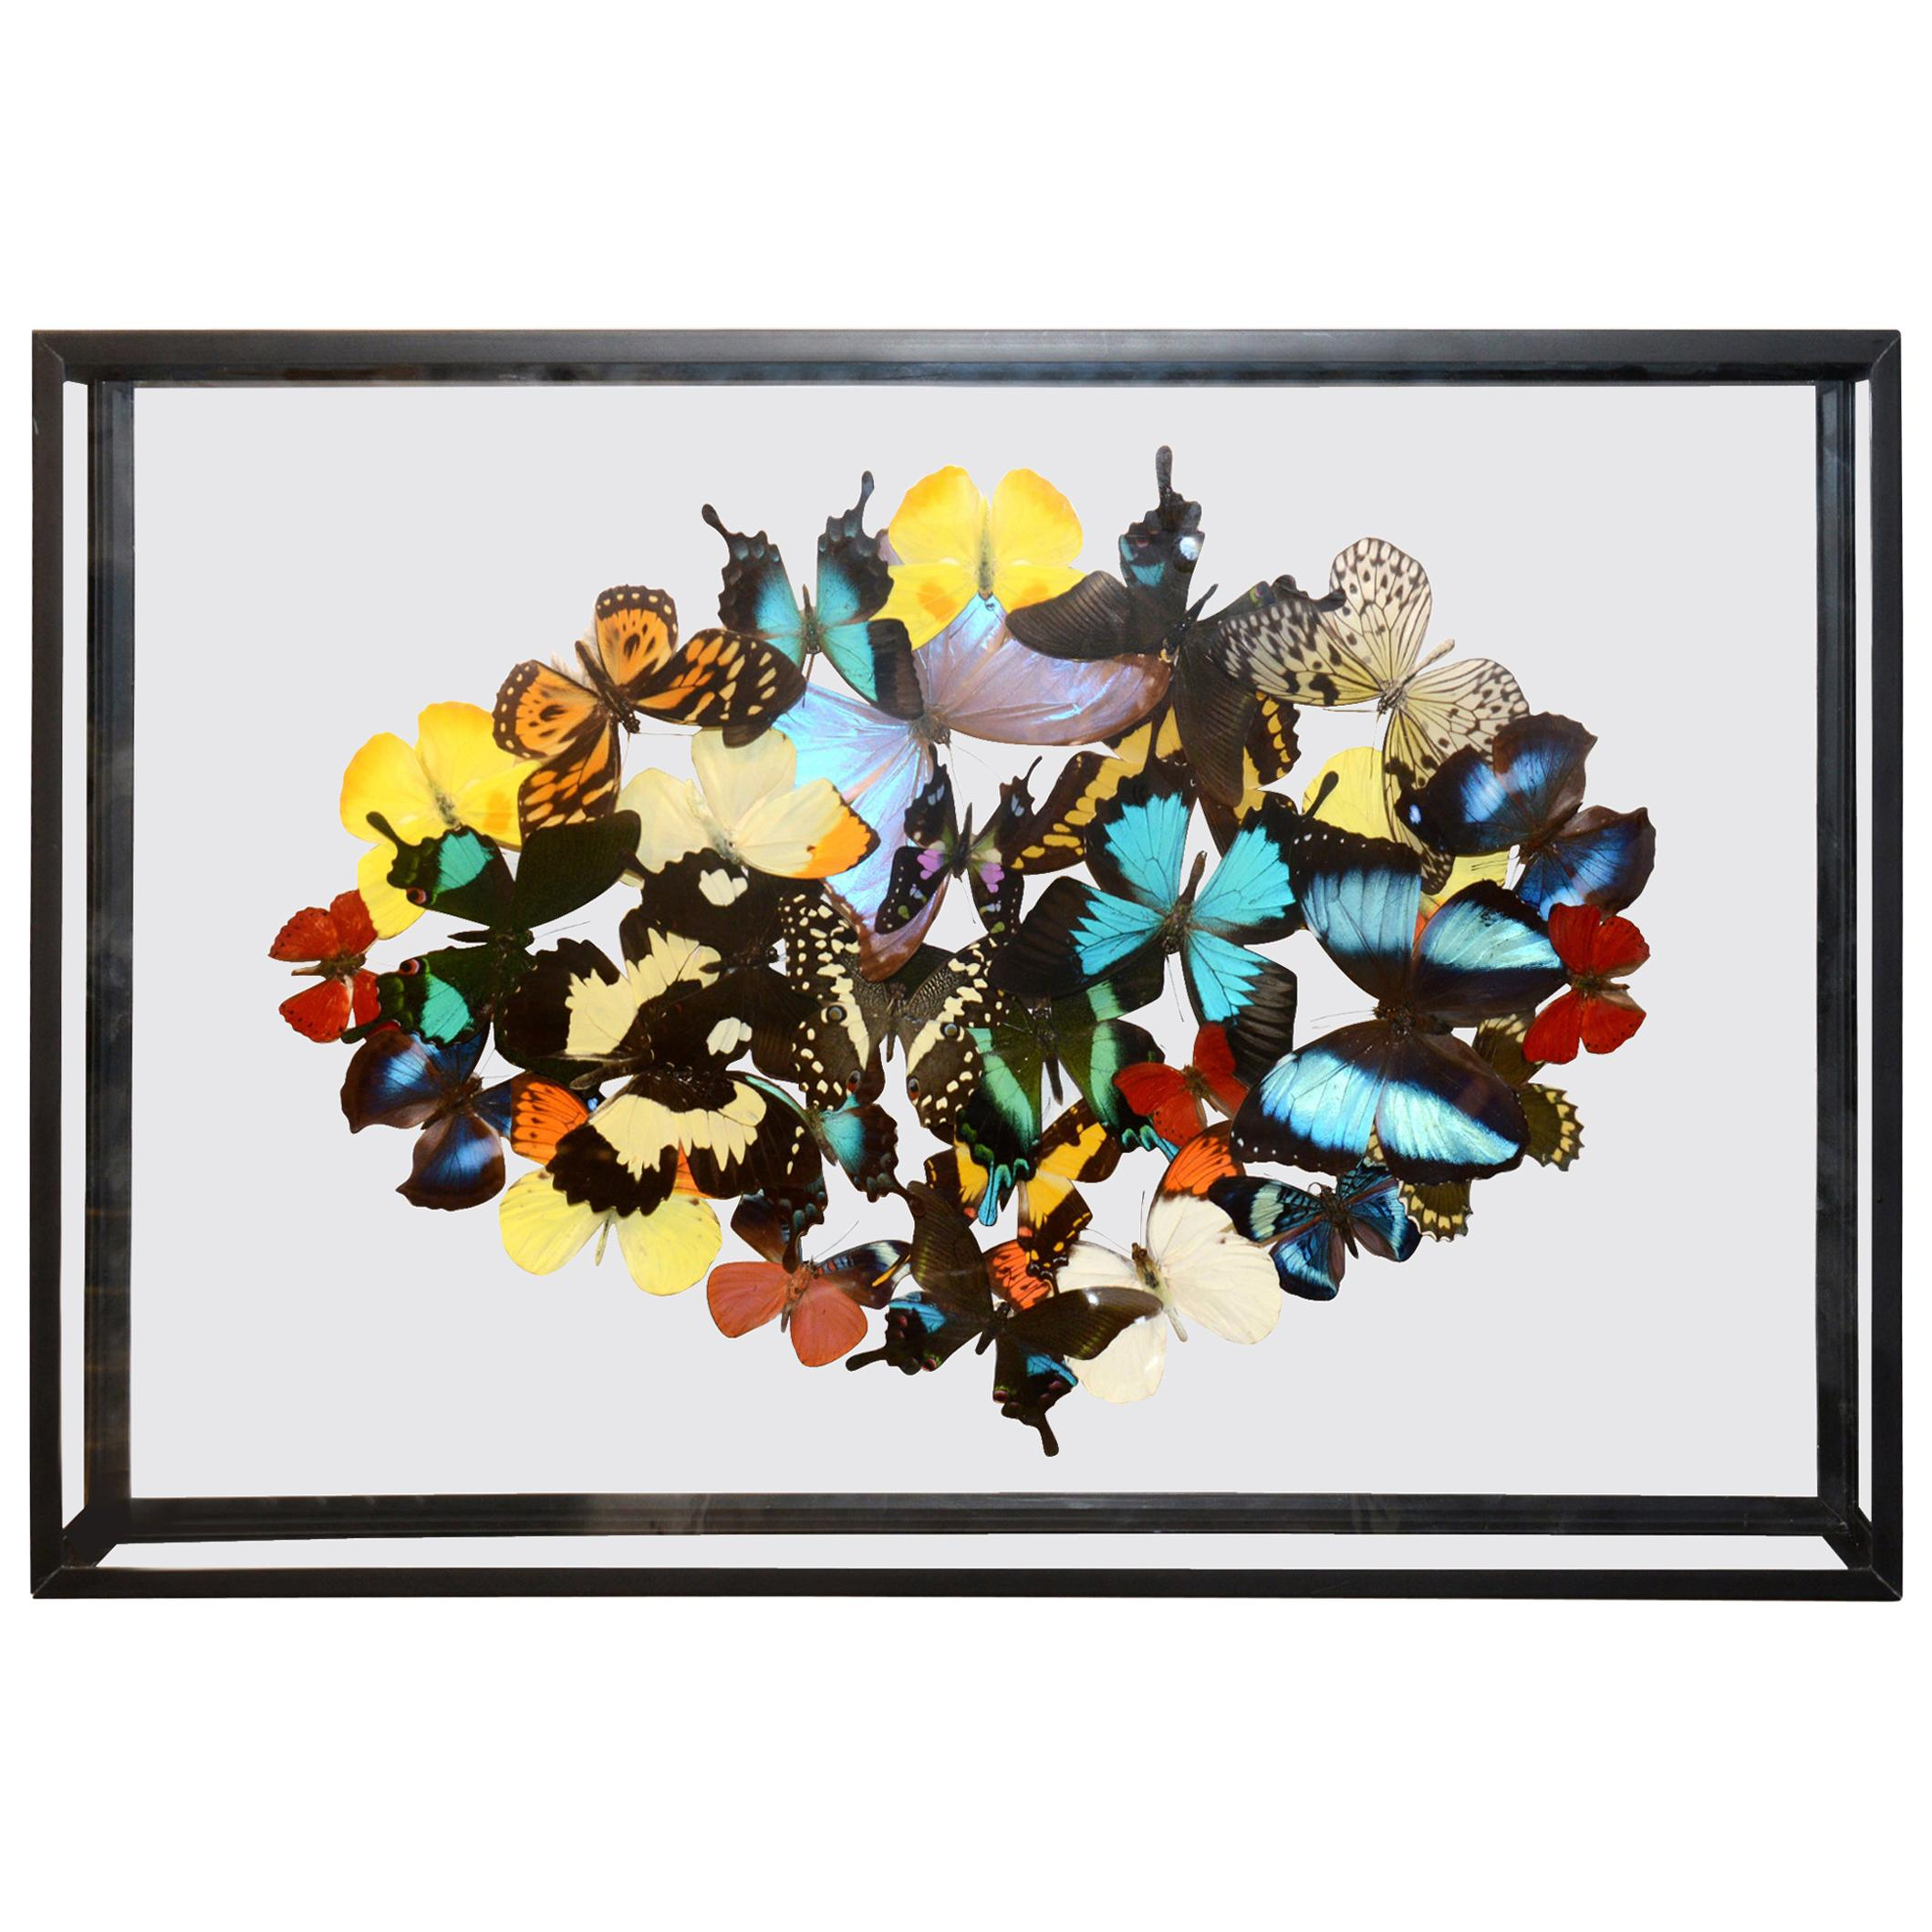 New And Custom Decorative Art